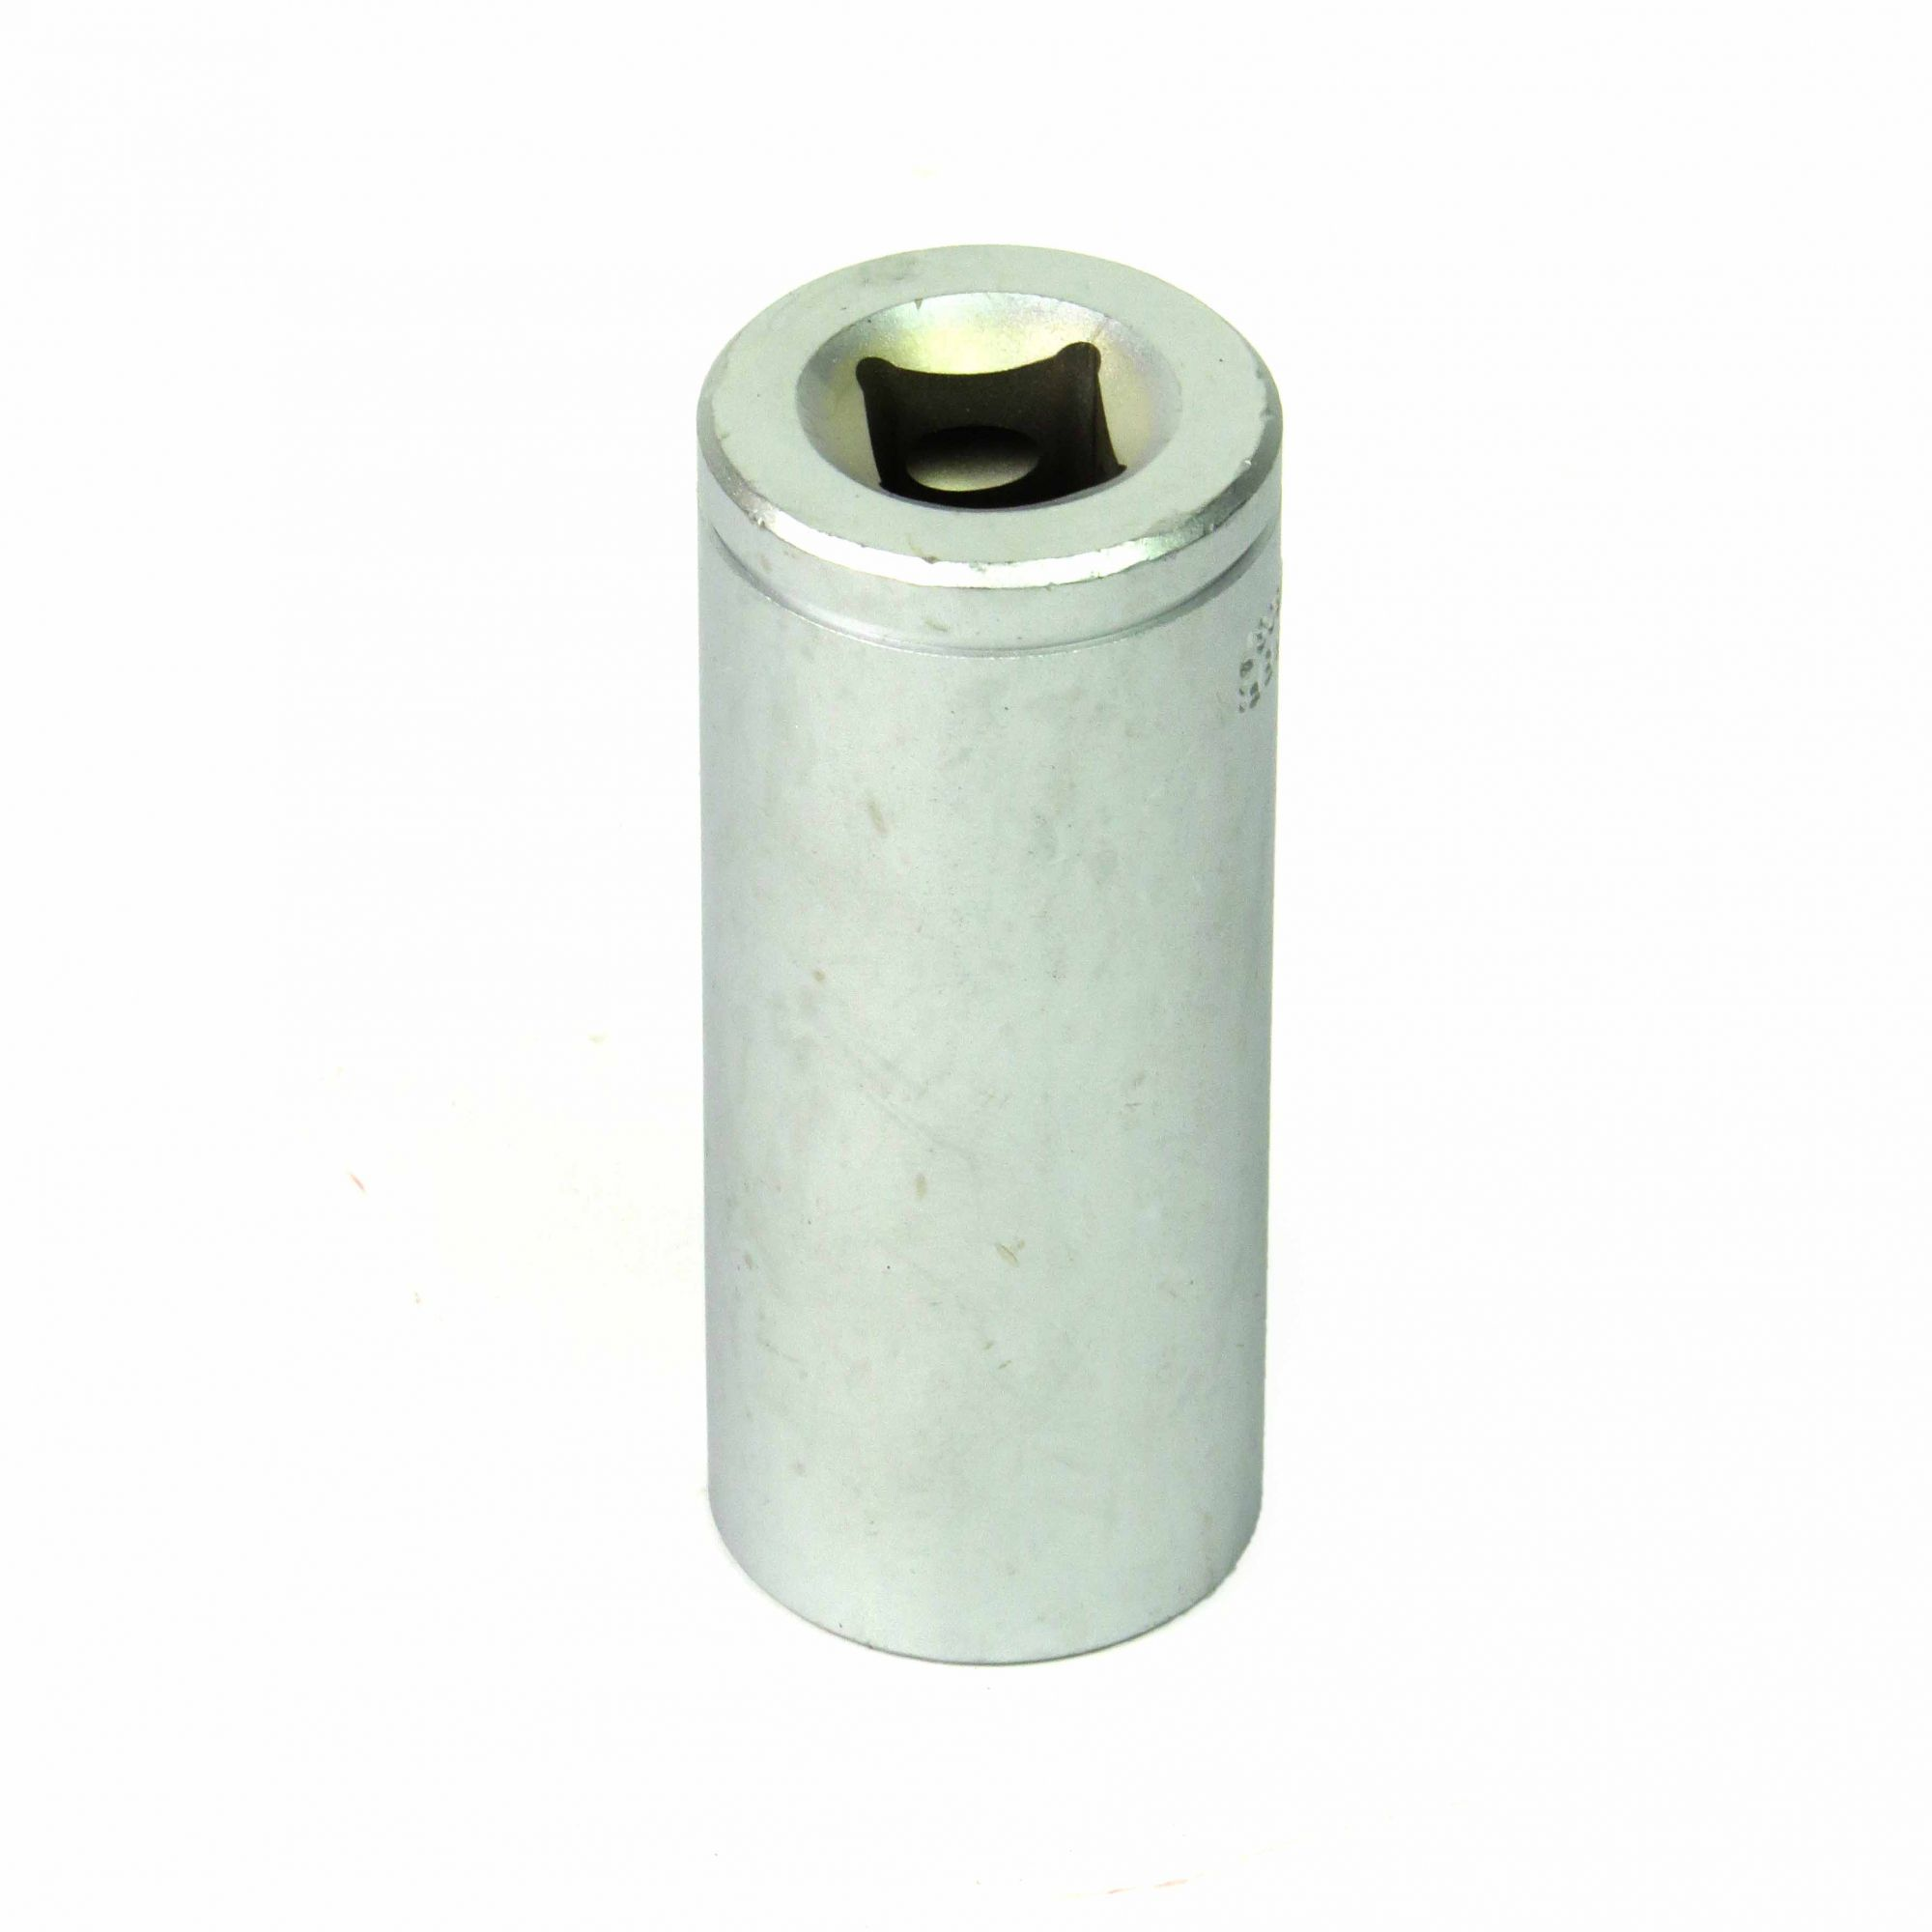 Soquete Estriado Longo 1/2Pol x24mm Waft